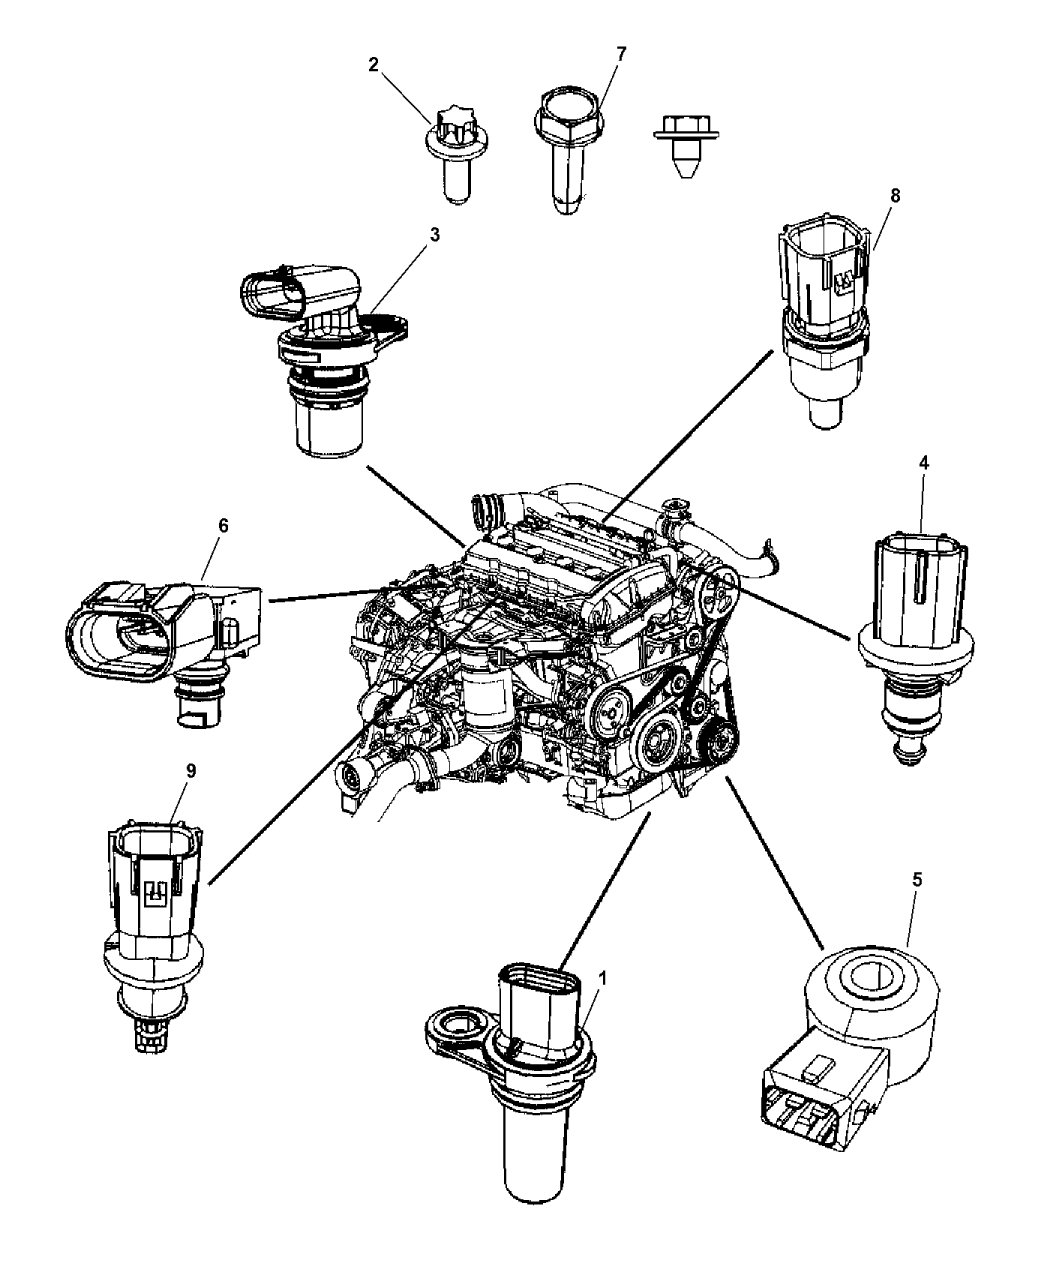 2008 jeep patriot sensors - engine